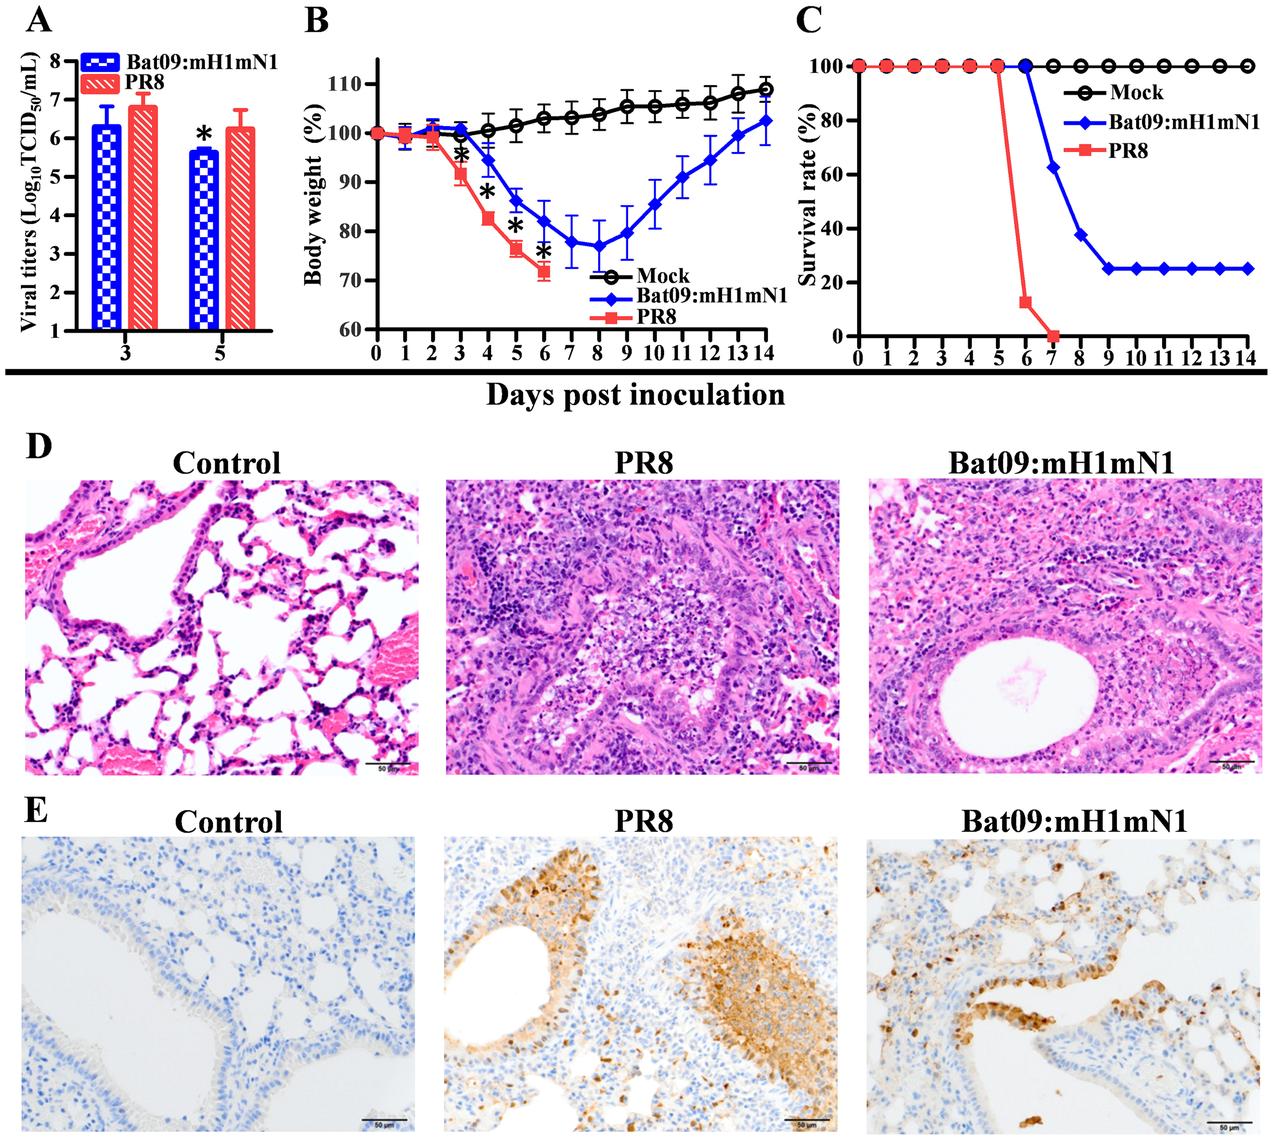 Pathogenicity of Bat09:mH1mN1 and PR8 viruses in mice.